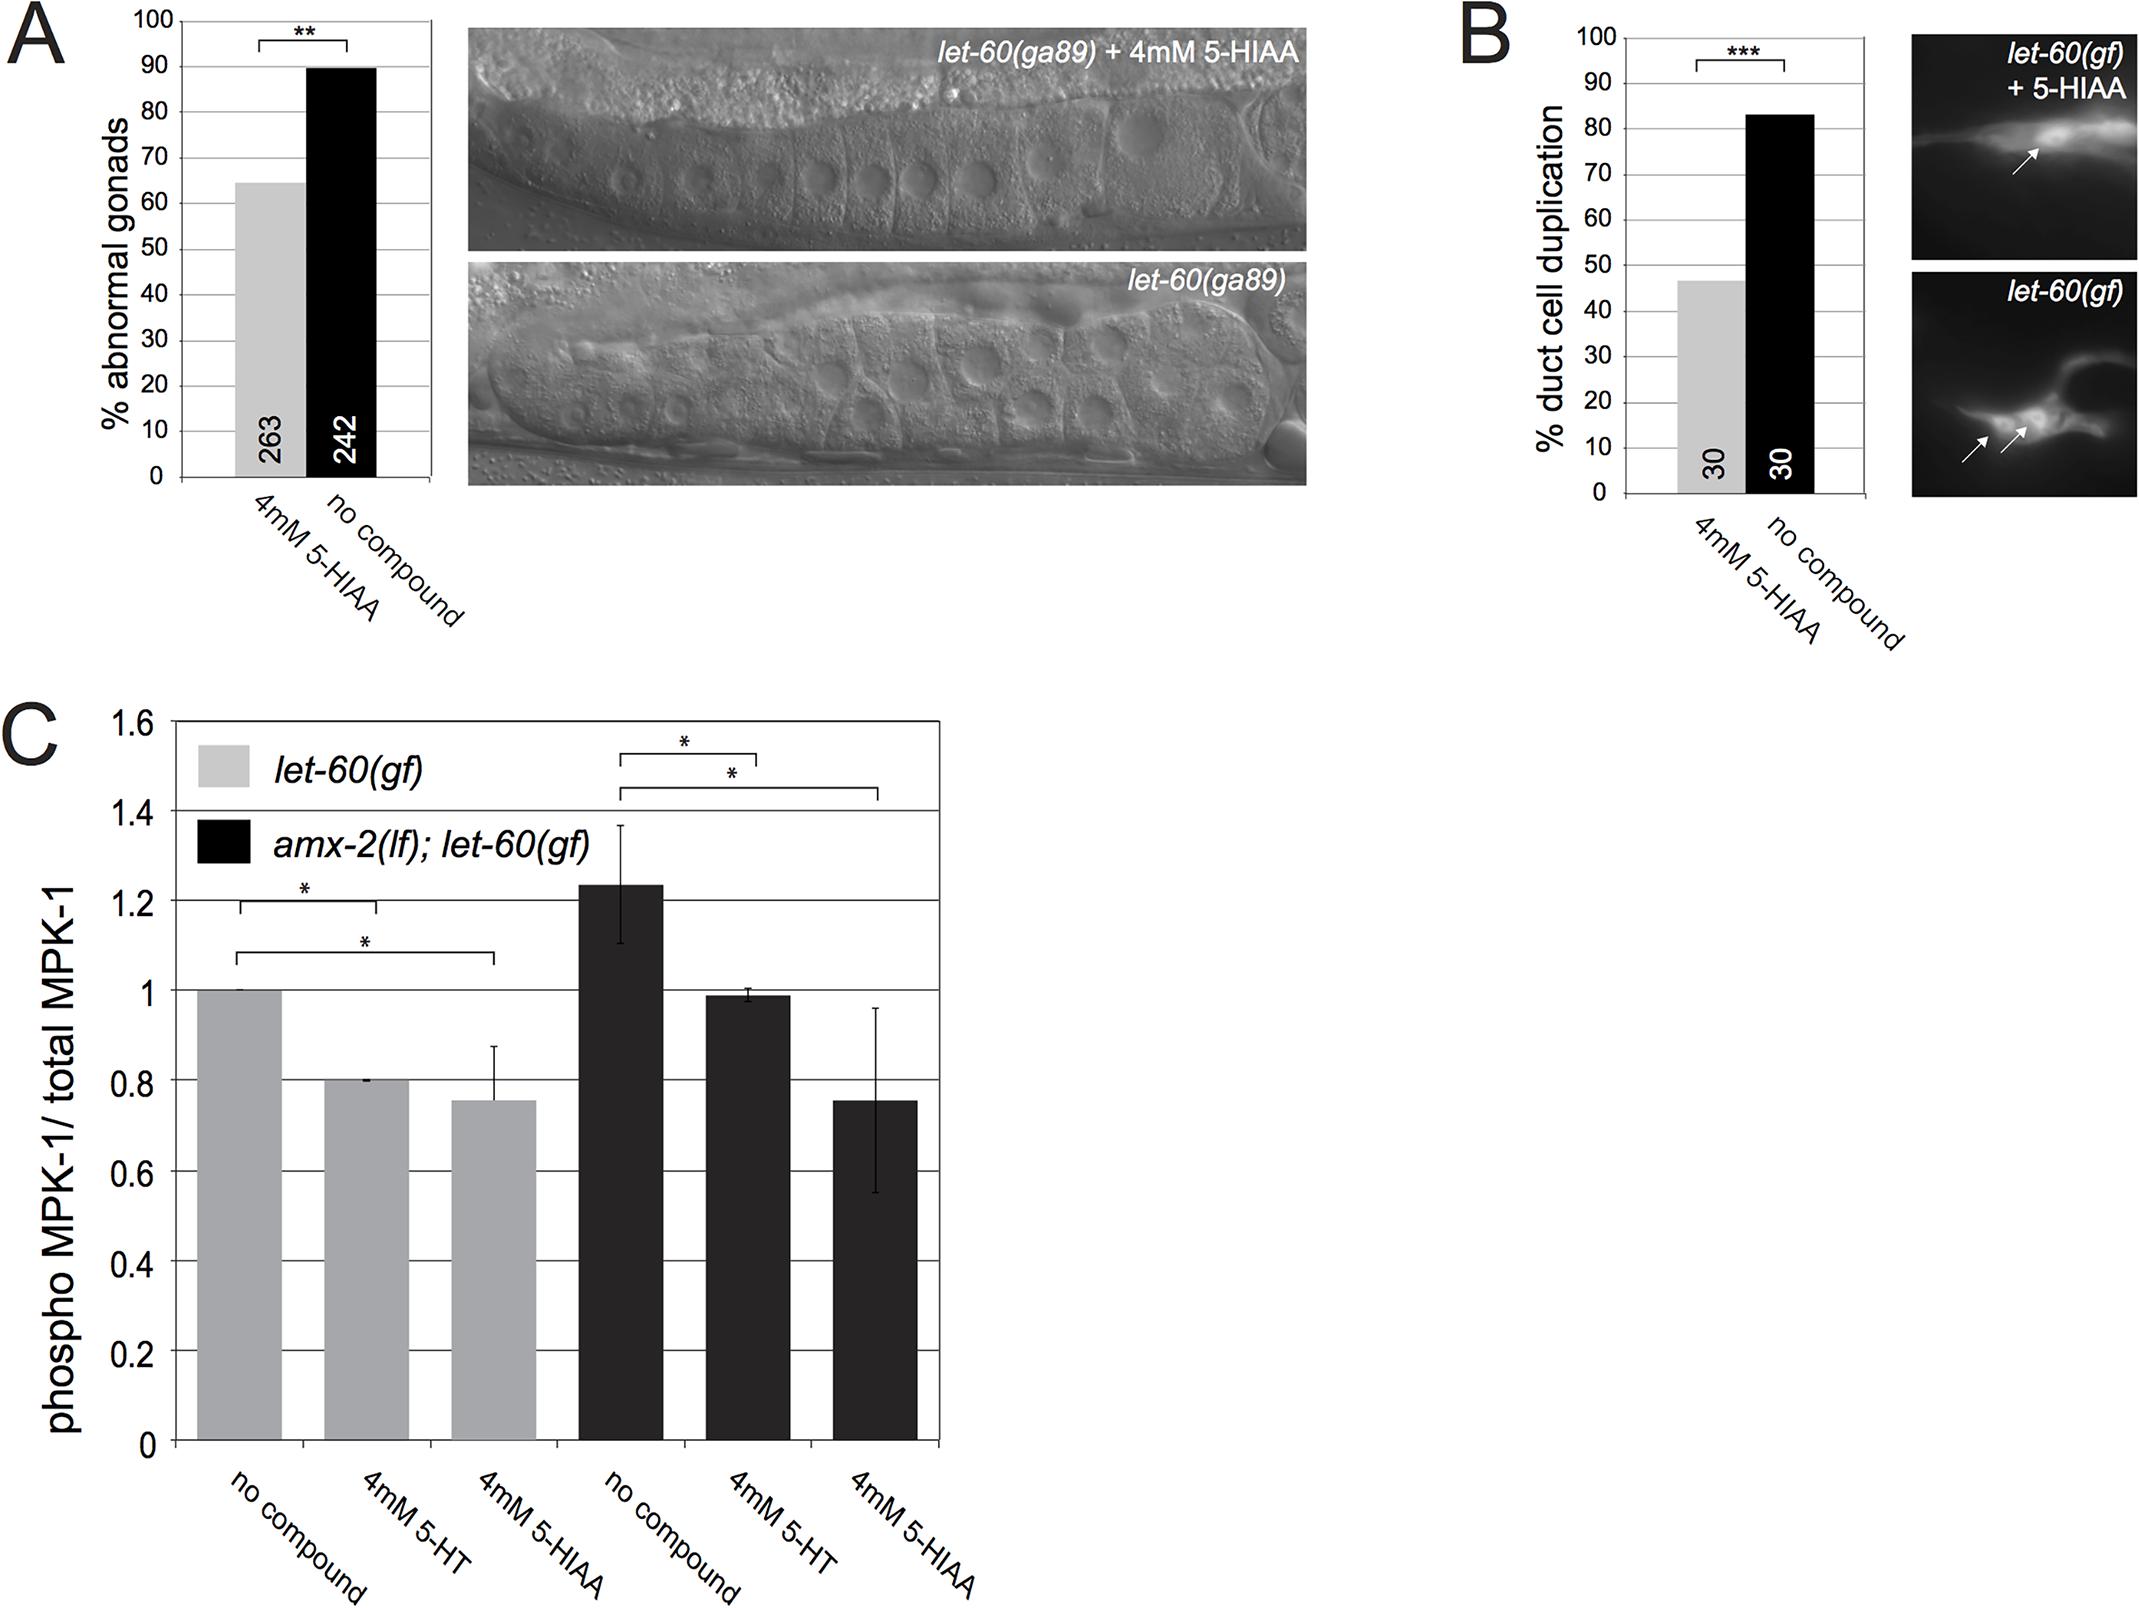 5-HIAA inhibits RAS/MAPK signaling and MPK-1 phosphorylation in multiple organs of <i>C</i>. <i>elegans</i>.